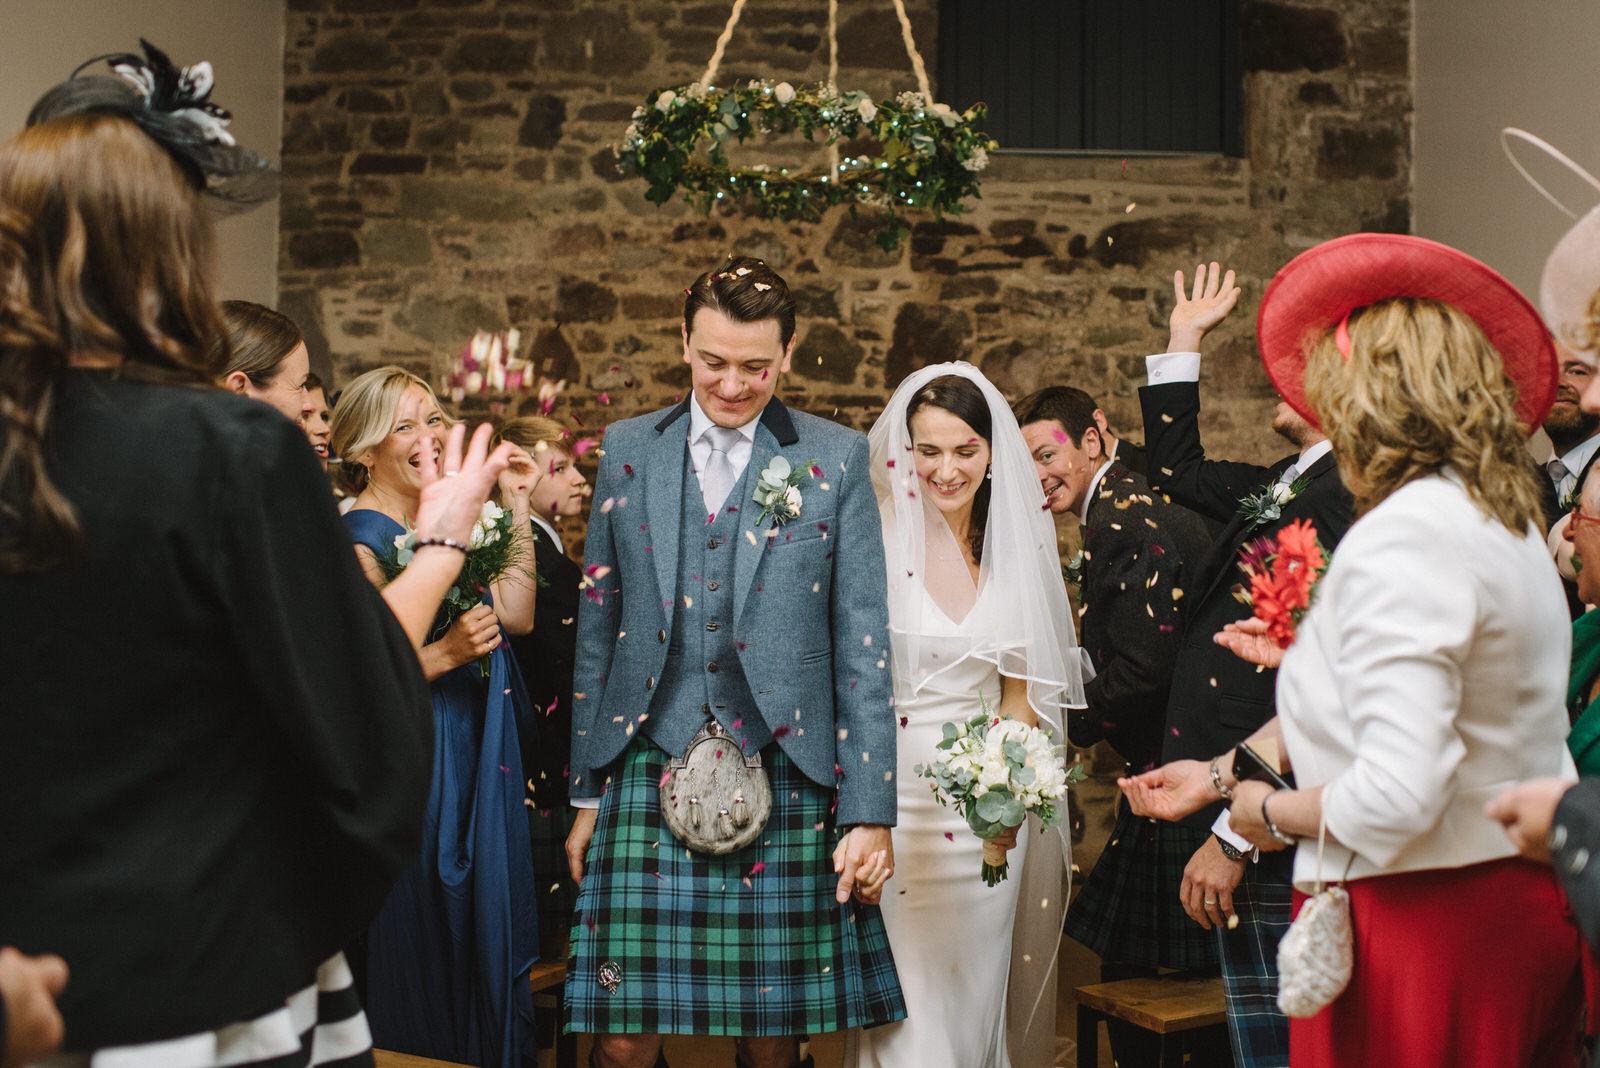 030-GUARDSWELL-FARM-WEDDING-ALTERNATIVE-SCOTTISH-WEDDING-PHOTOGRAPHER-SCOTTISH-WEDDING-DESTINATION-WEDDING-PHOTOGRAPHER.JPG